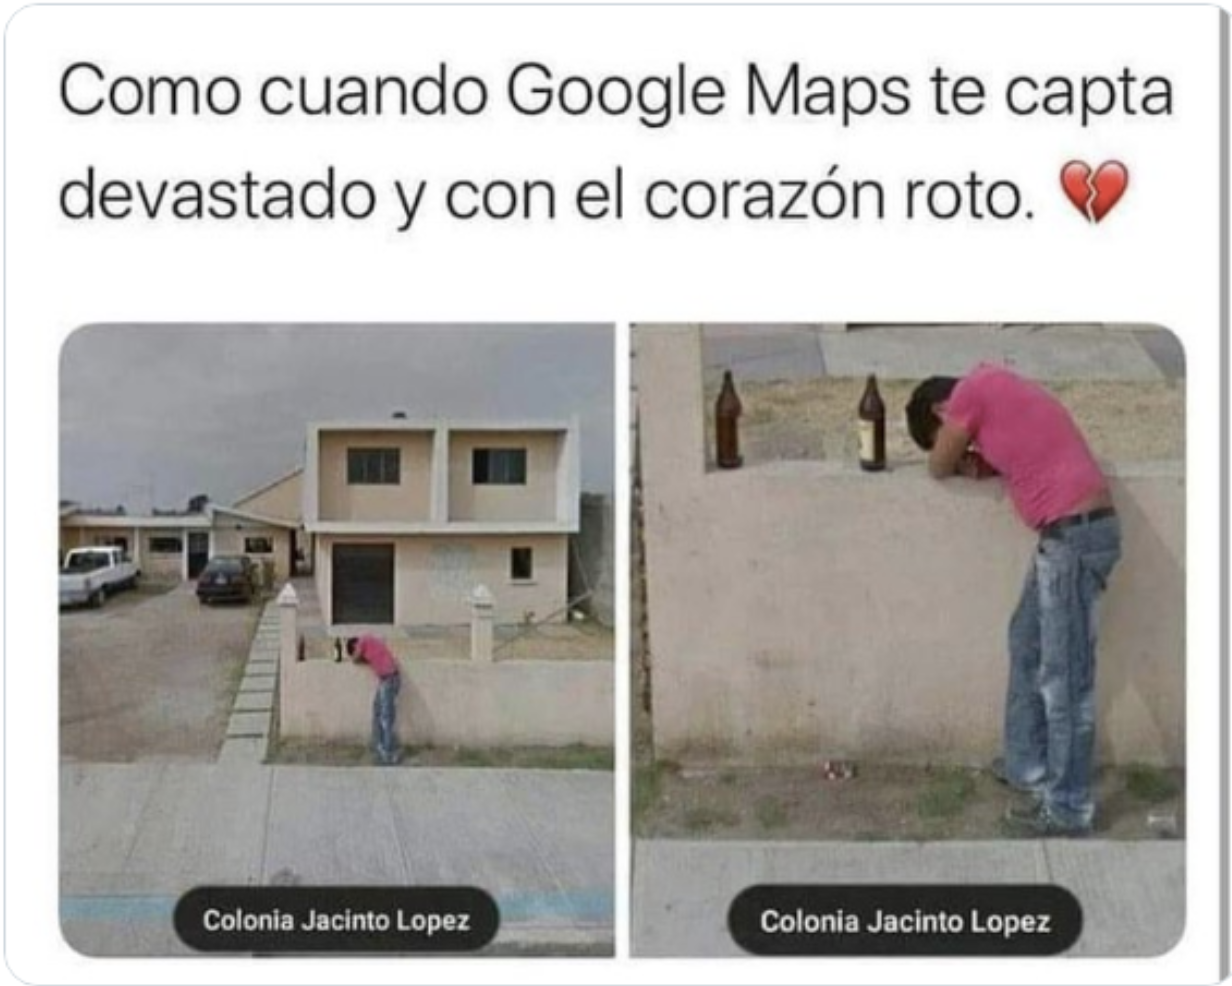 corazón roto google maps cdmx meme